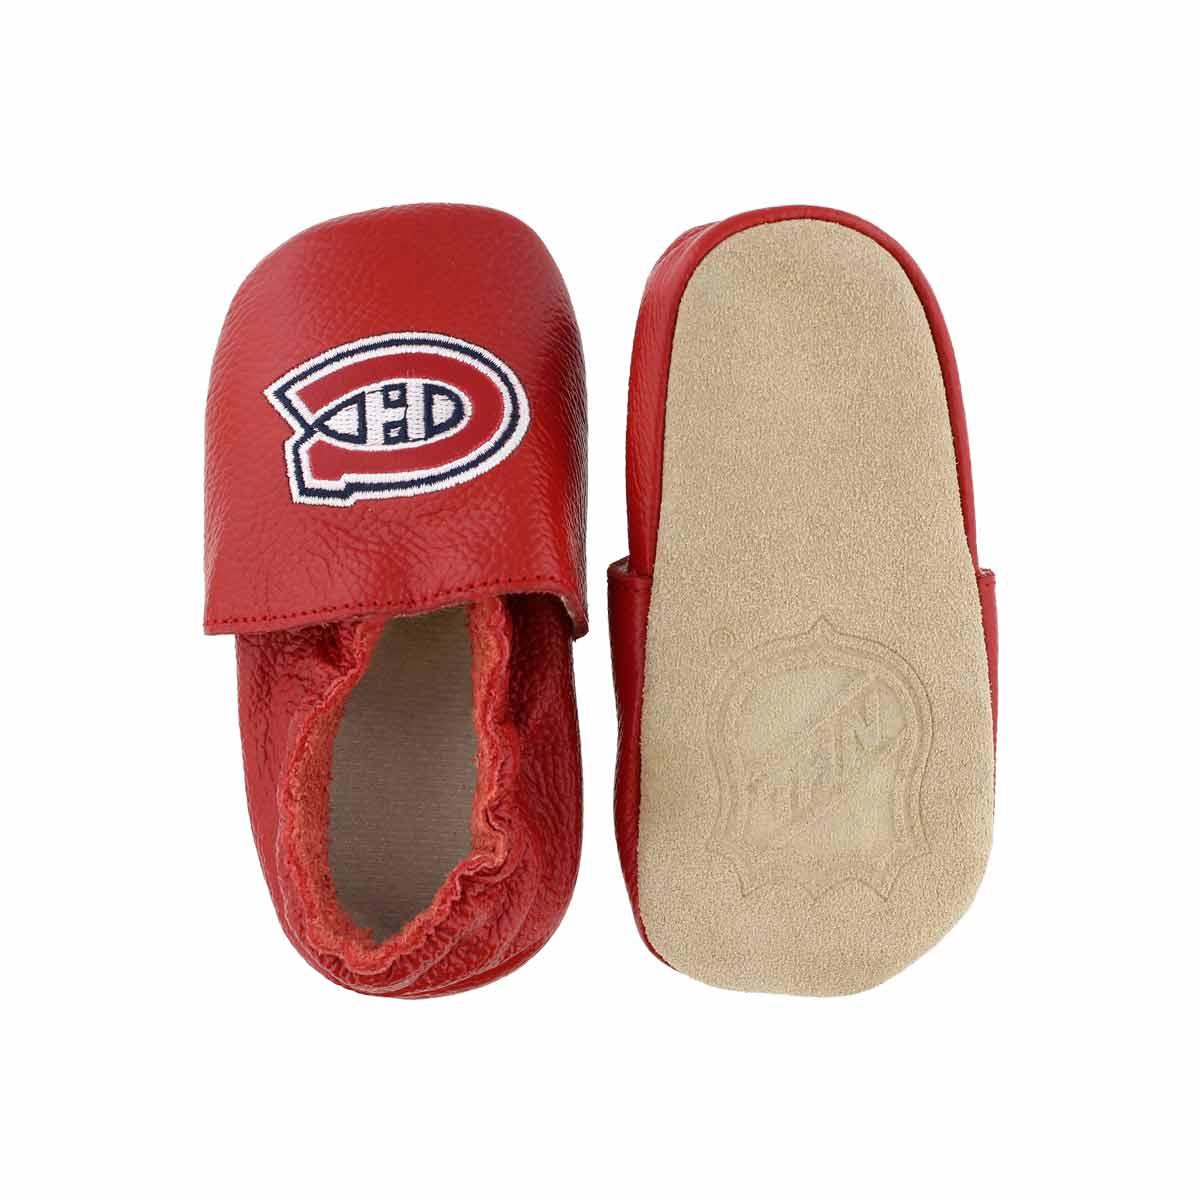 Infs-b Habs red slipper